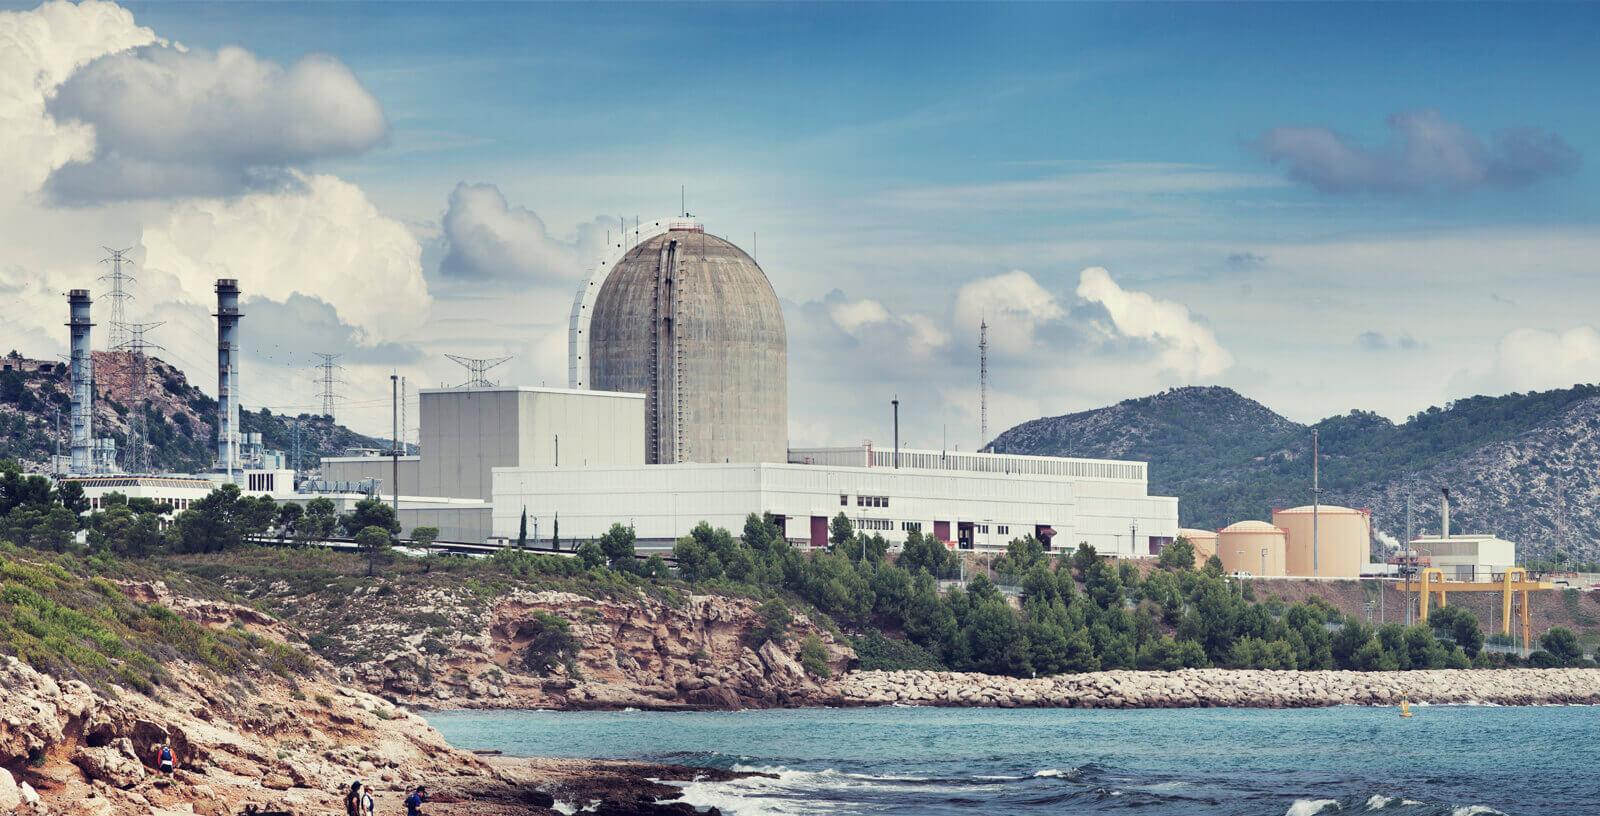 Idom_Nuclear_Services_ANAV_CNAT_NUCLENOR_Lifetime_Management_projects_Asco_Vandellos_Almaraz_Trillo_Garo_a_nuclear_power_plants_Gestion_Vida_AlfonsoCalza